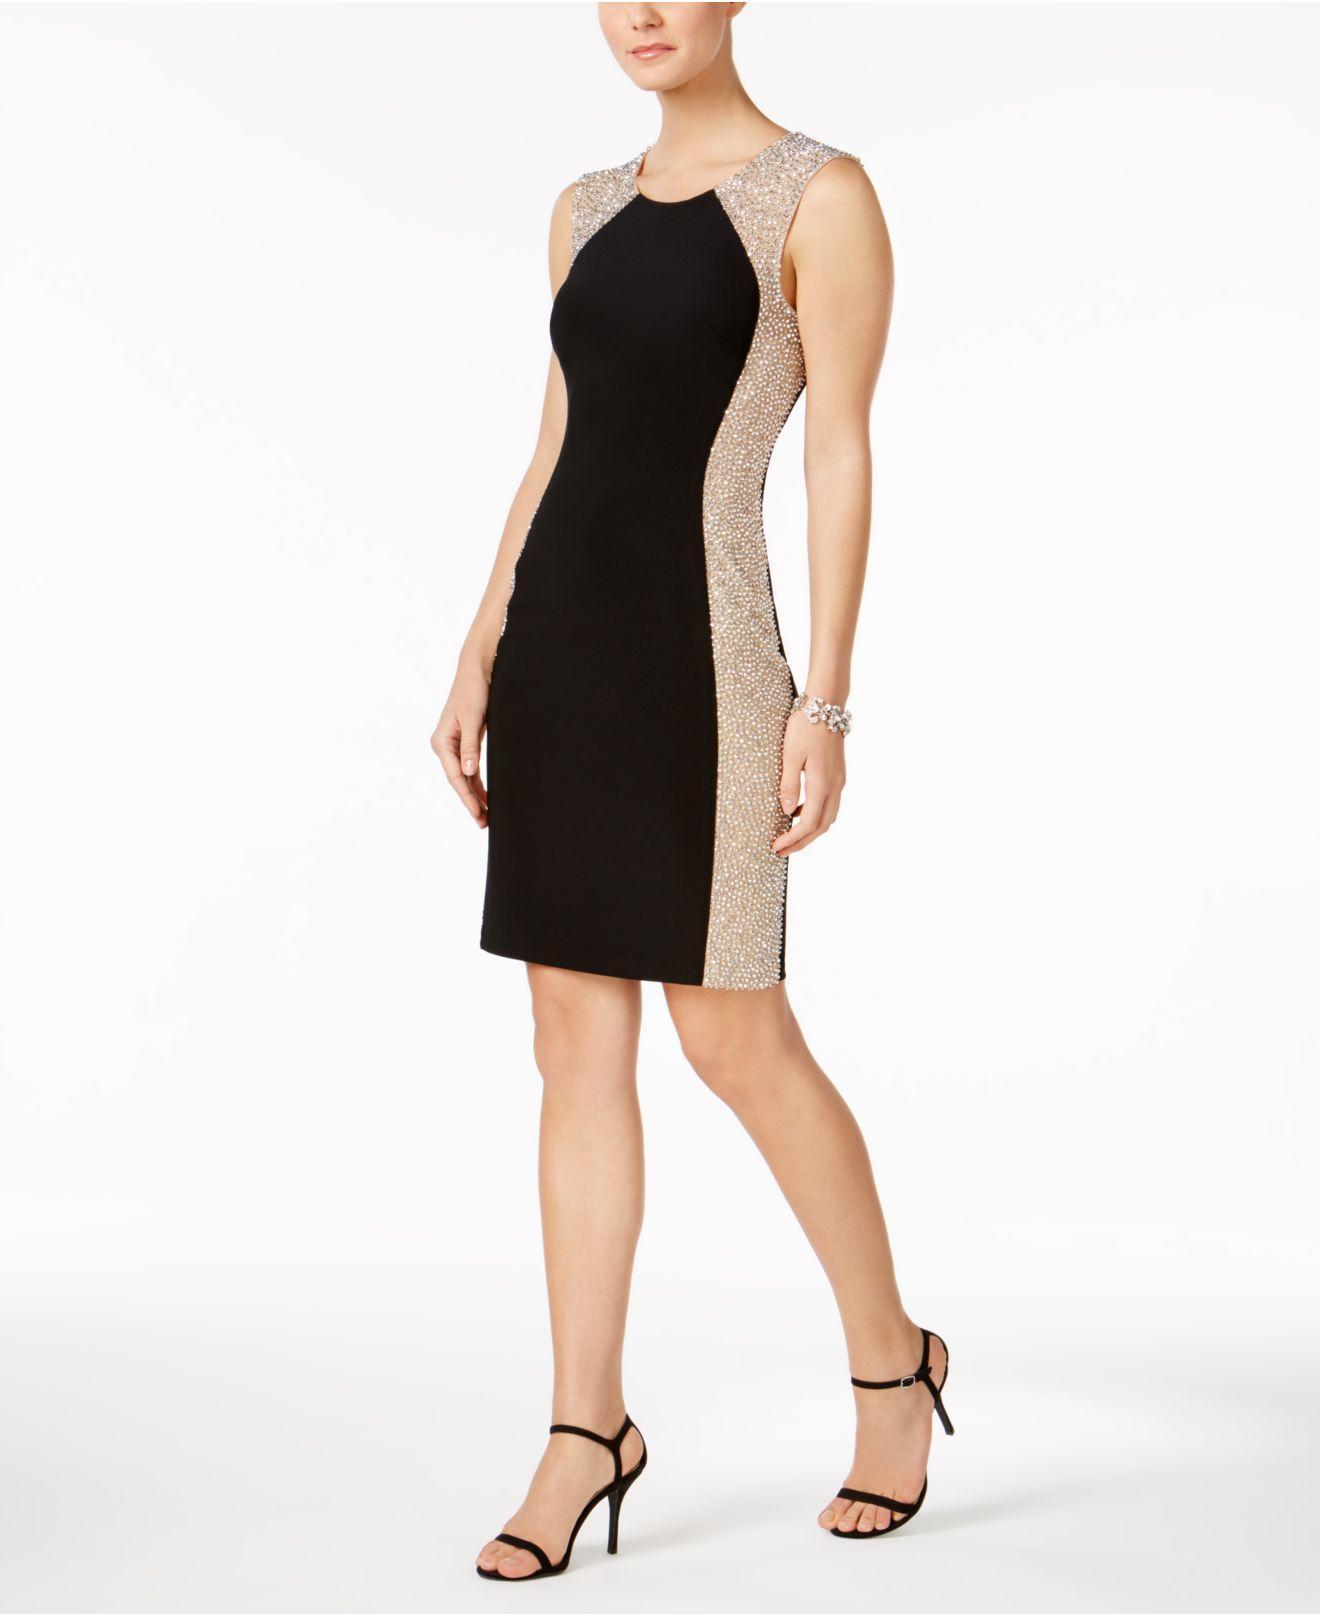 305621d6abbc Xscape Petite Beaded Bodycon Dress in Black - Lyst